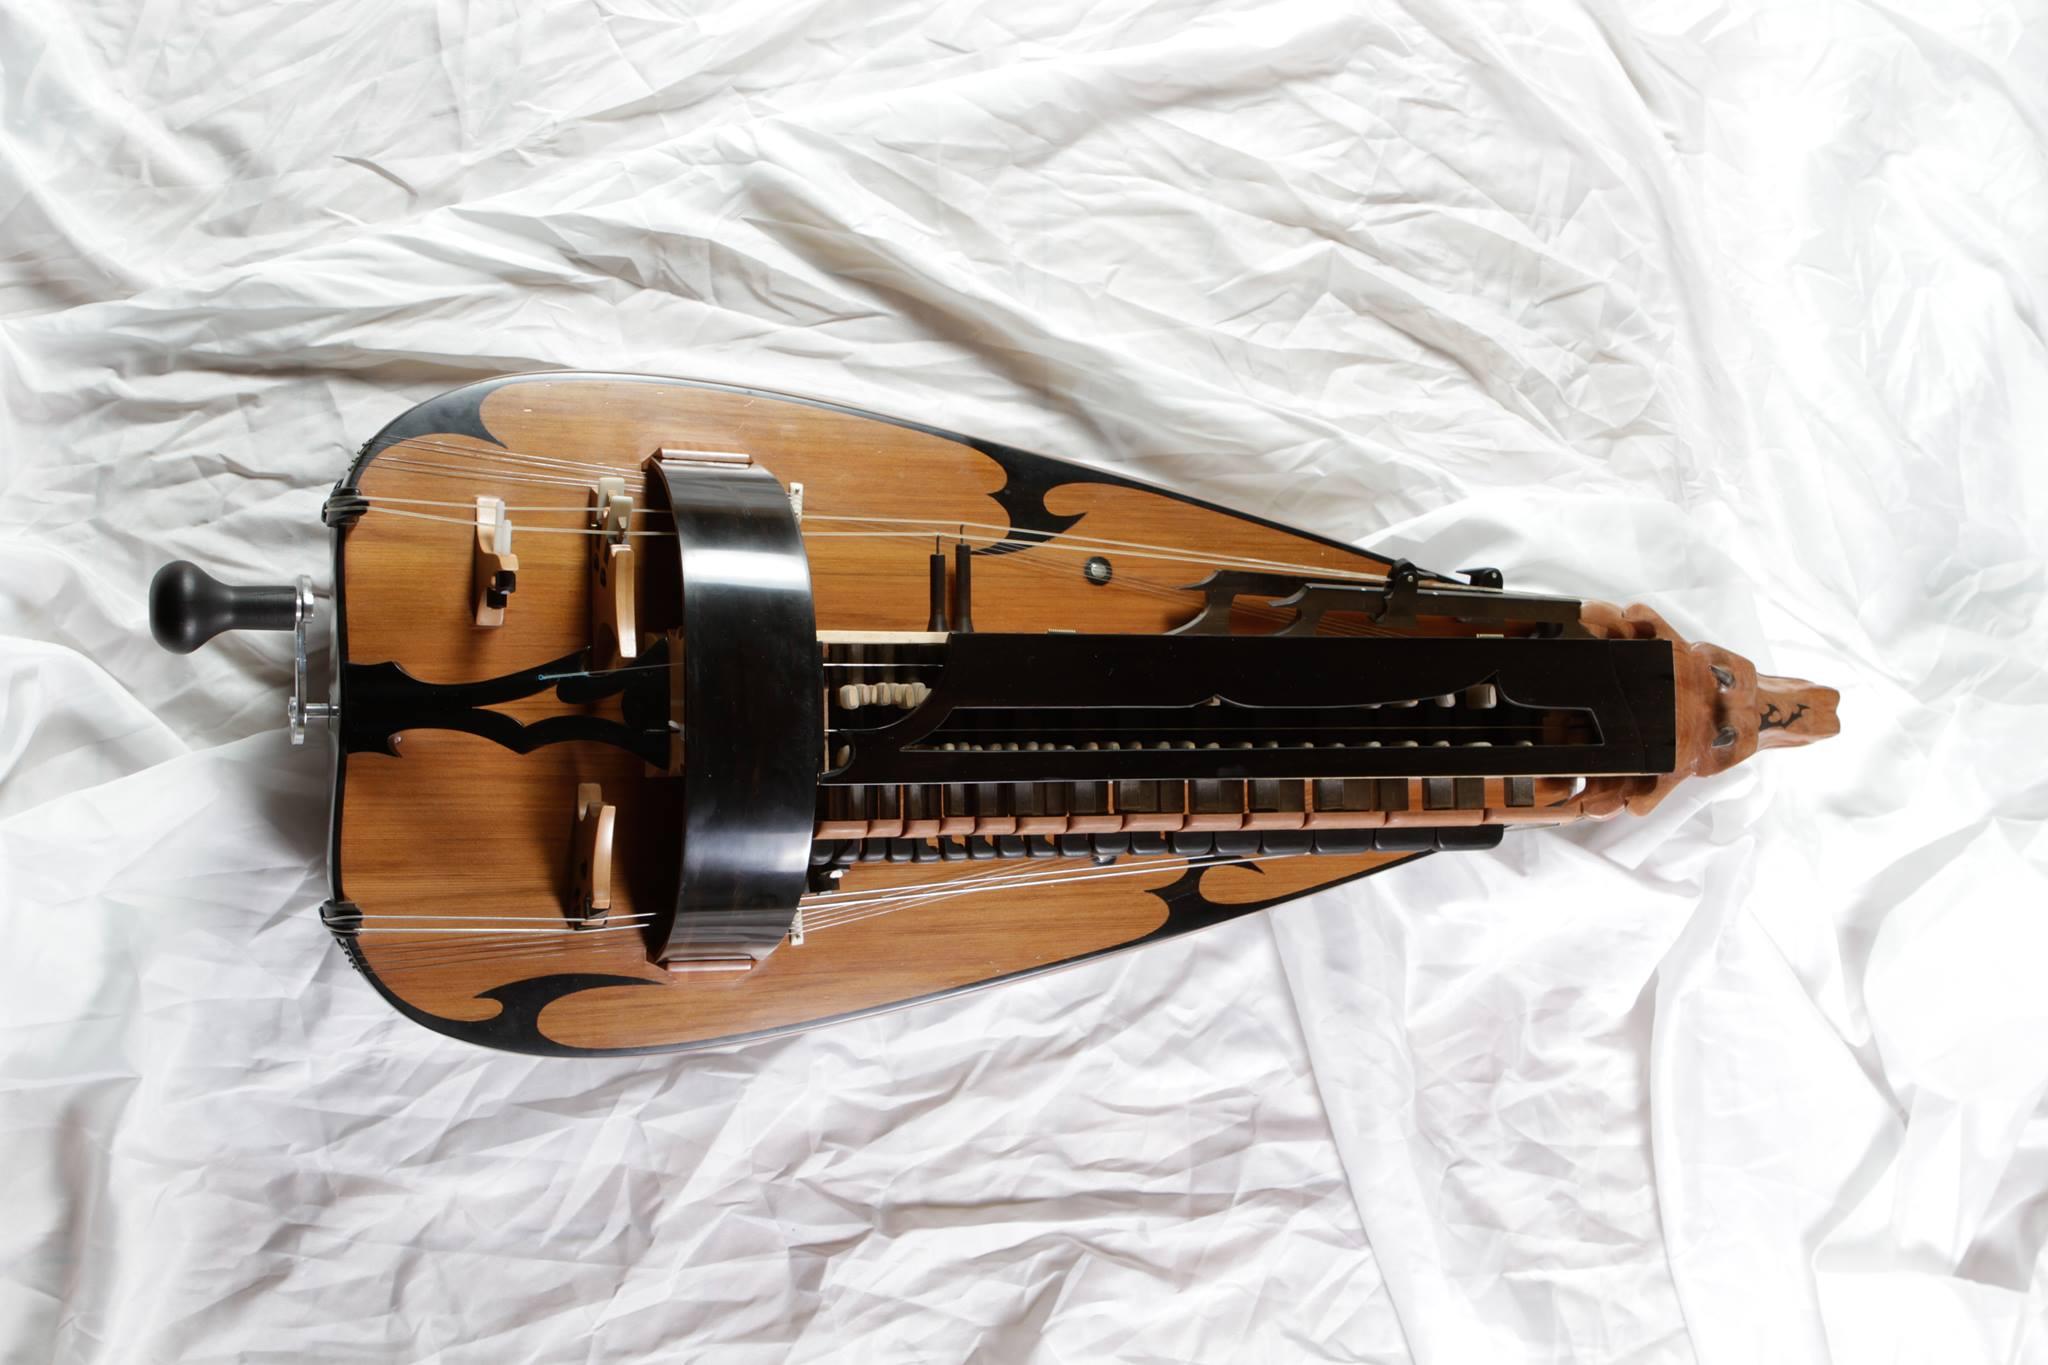 elektrische-drehleier-hurdy-gurdy-by-guilhem-desq